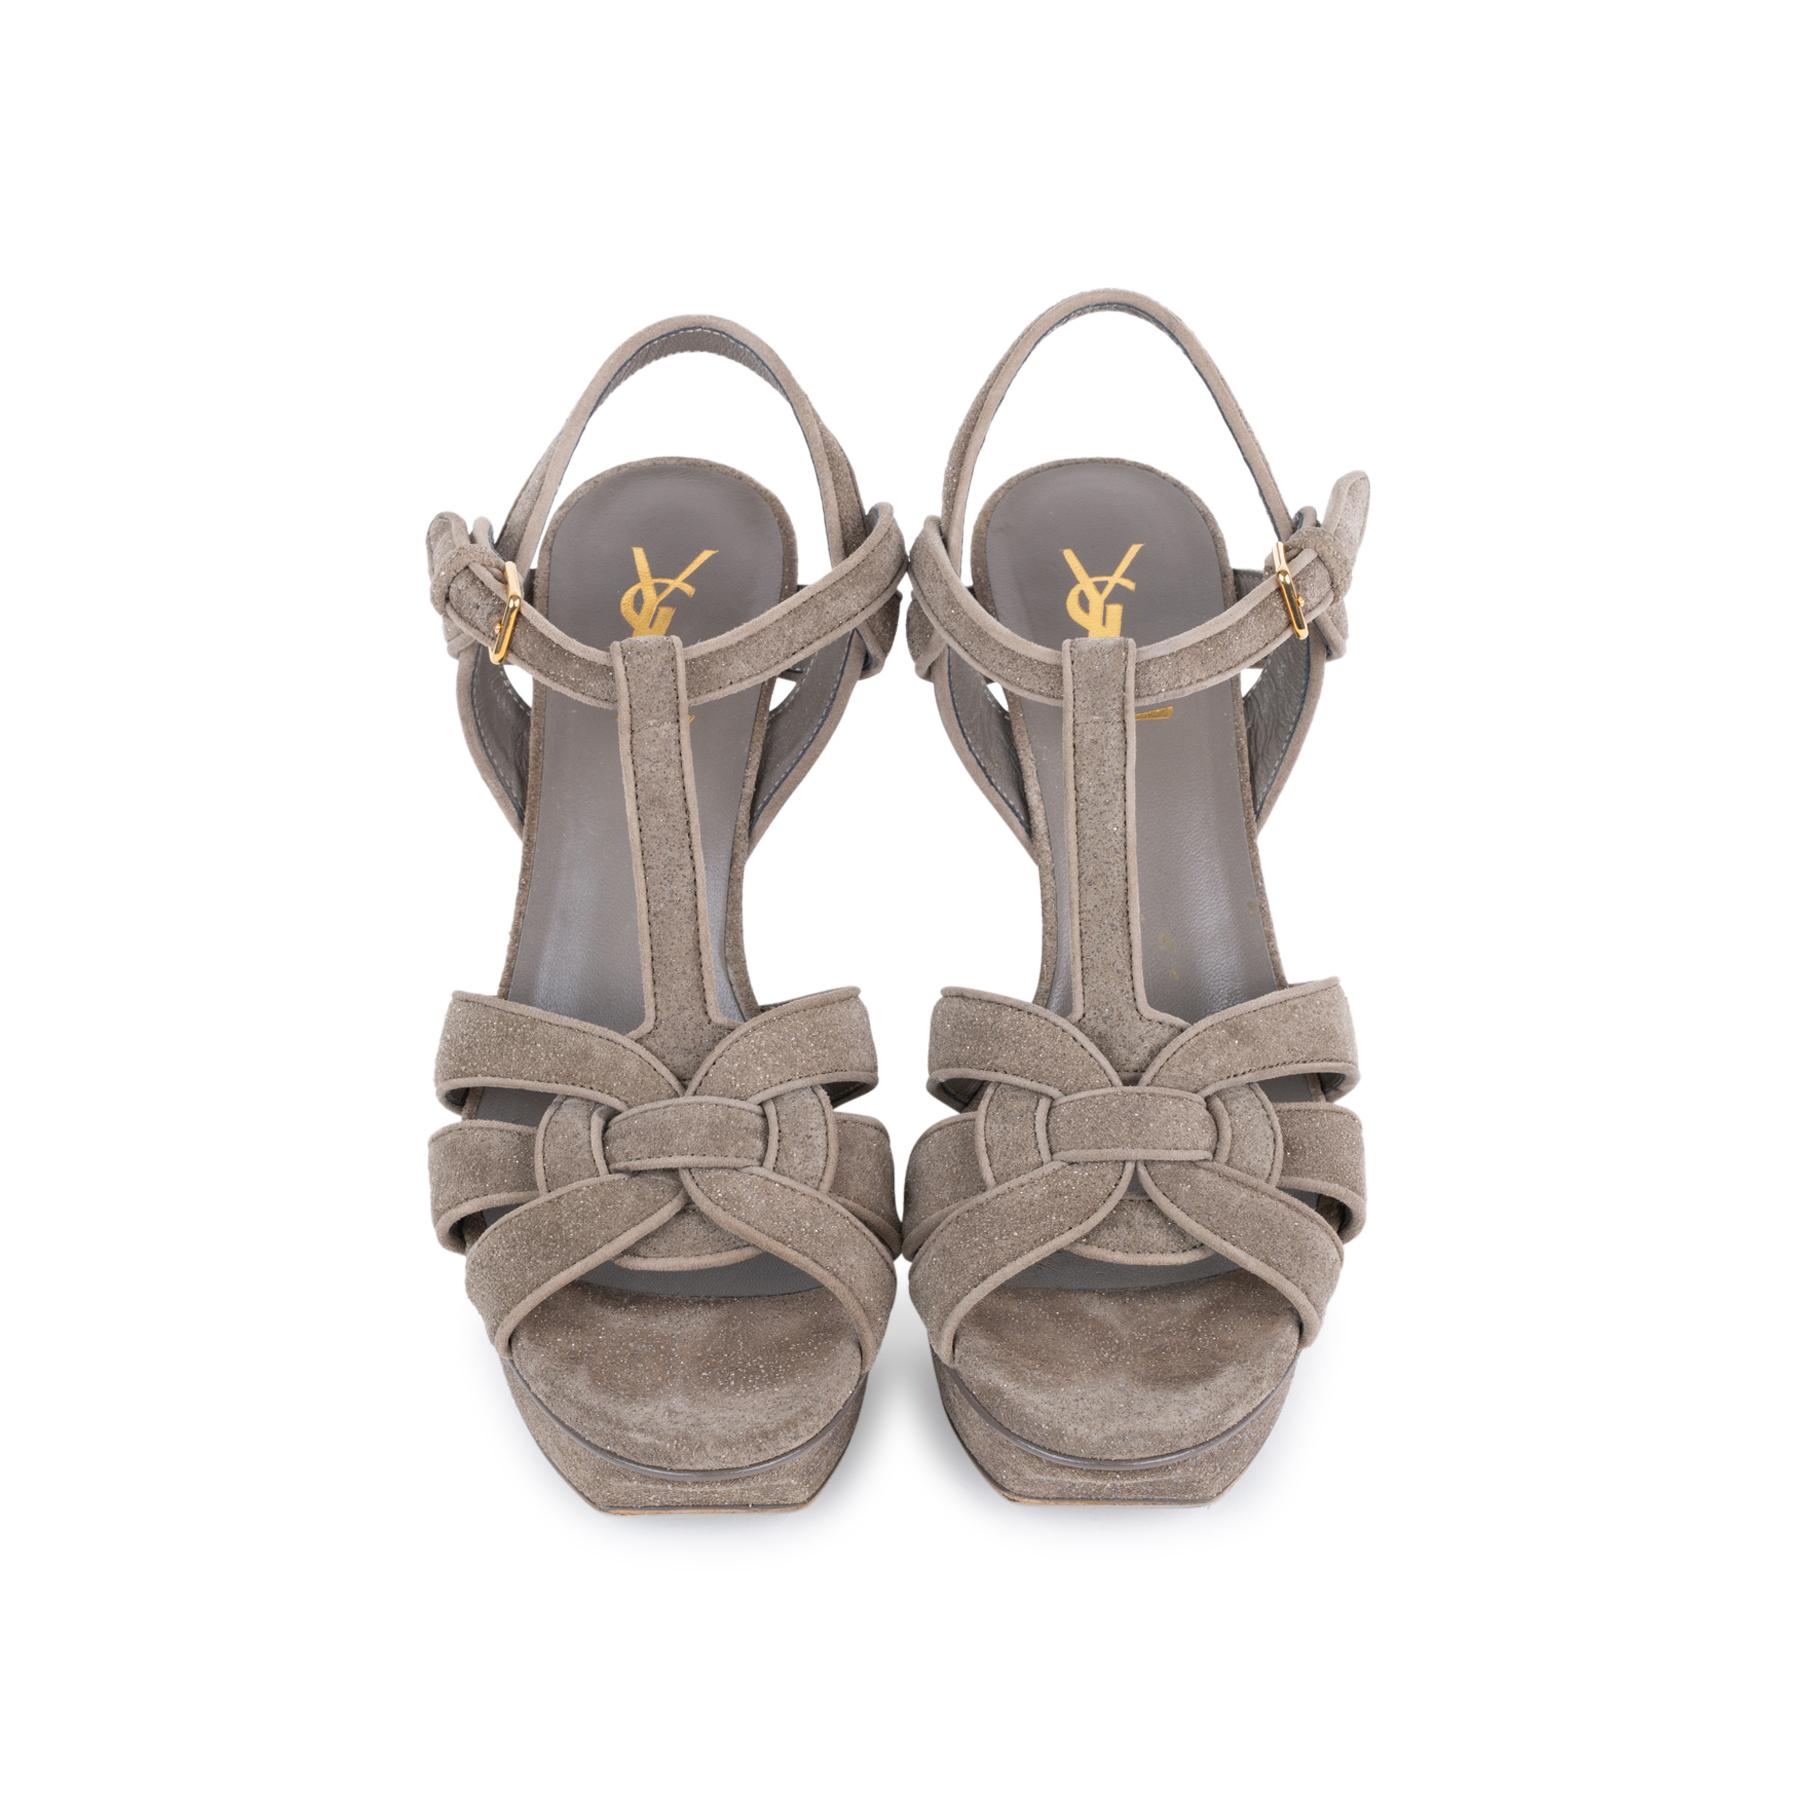 98350f5b0bcc58 Authentic Second Hand Yves Saint Laurent Glitter Effect Tribute Sandals  (PSS-328-00019)